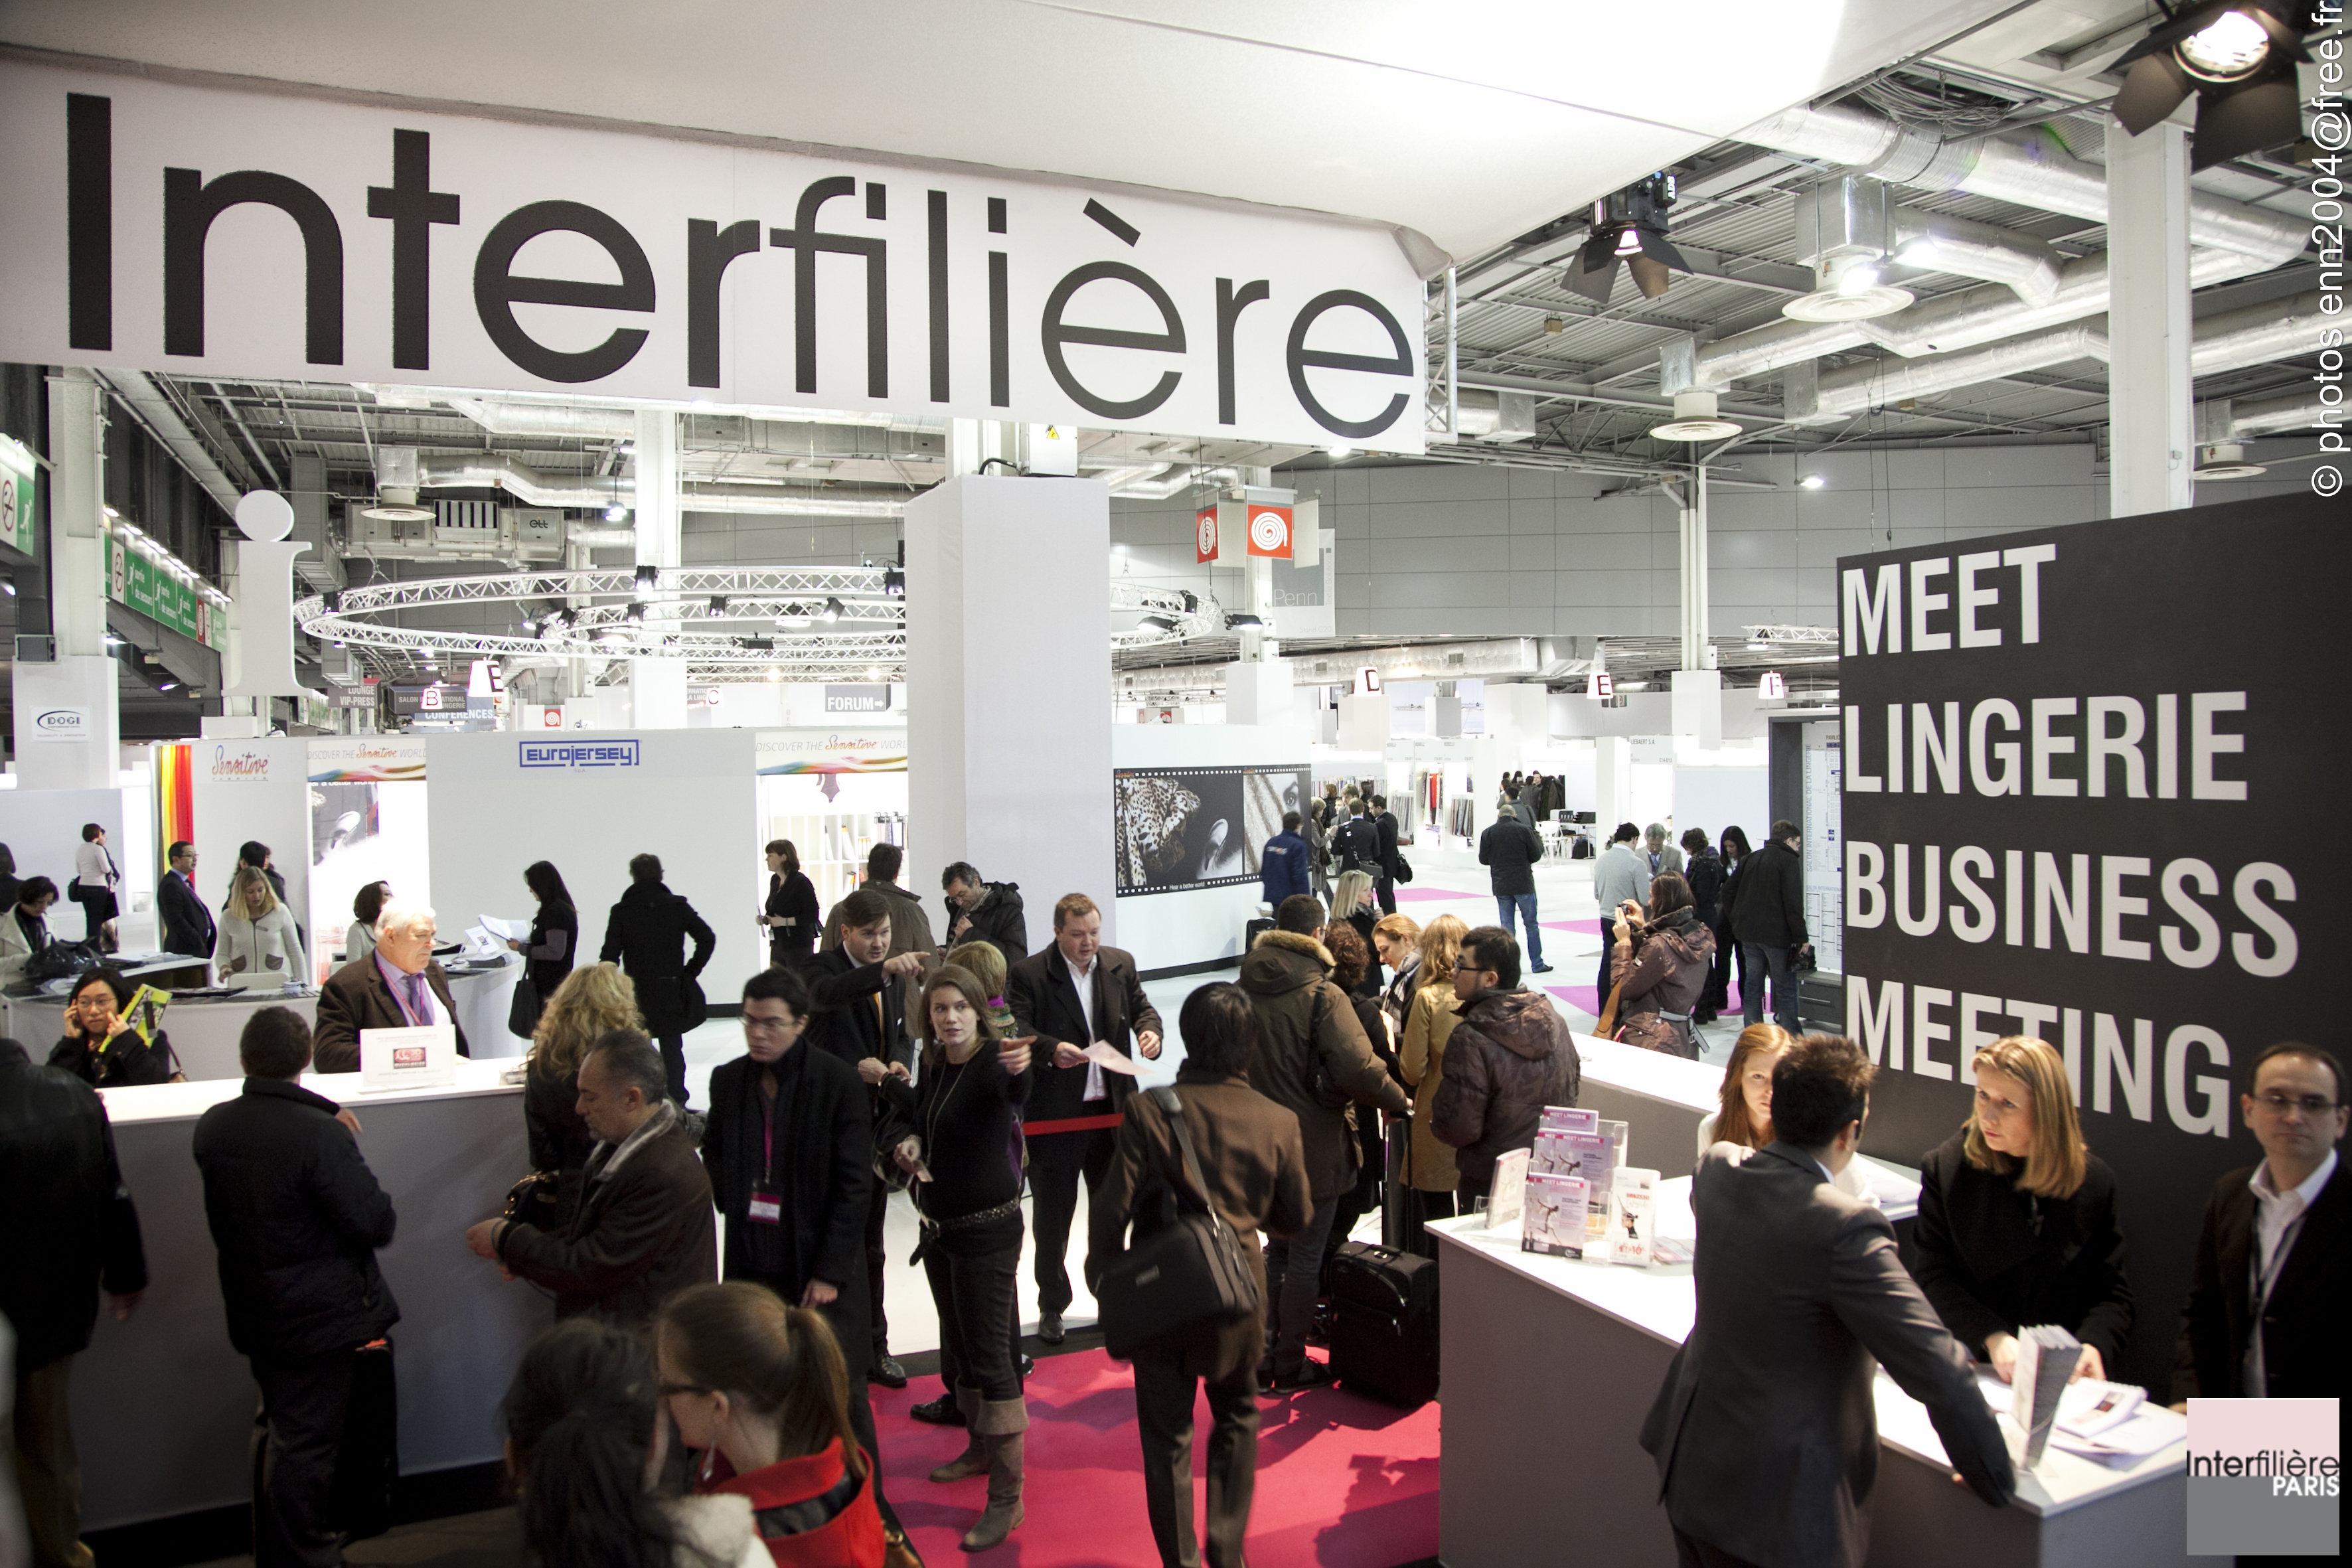 Scatti dal salon de la lingerie e interfiliere 2011 for Salon international lingerie